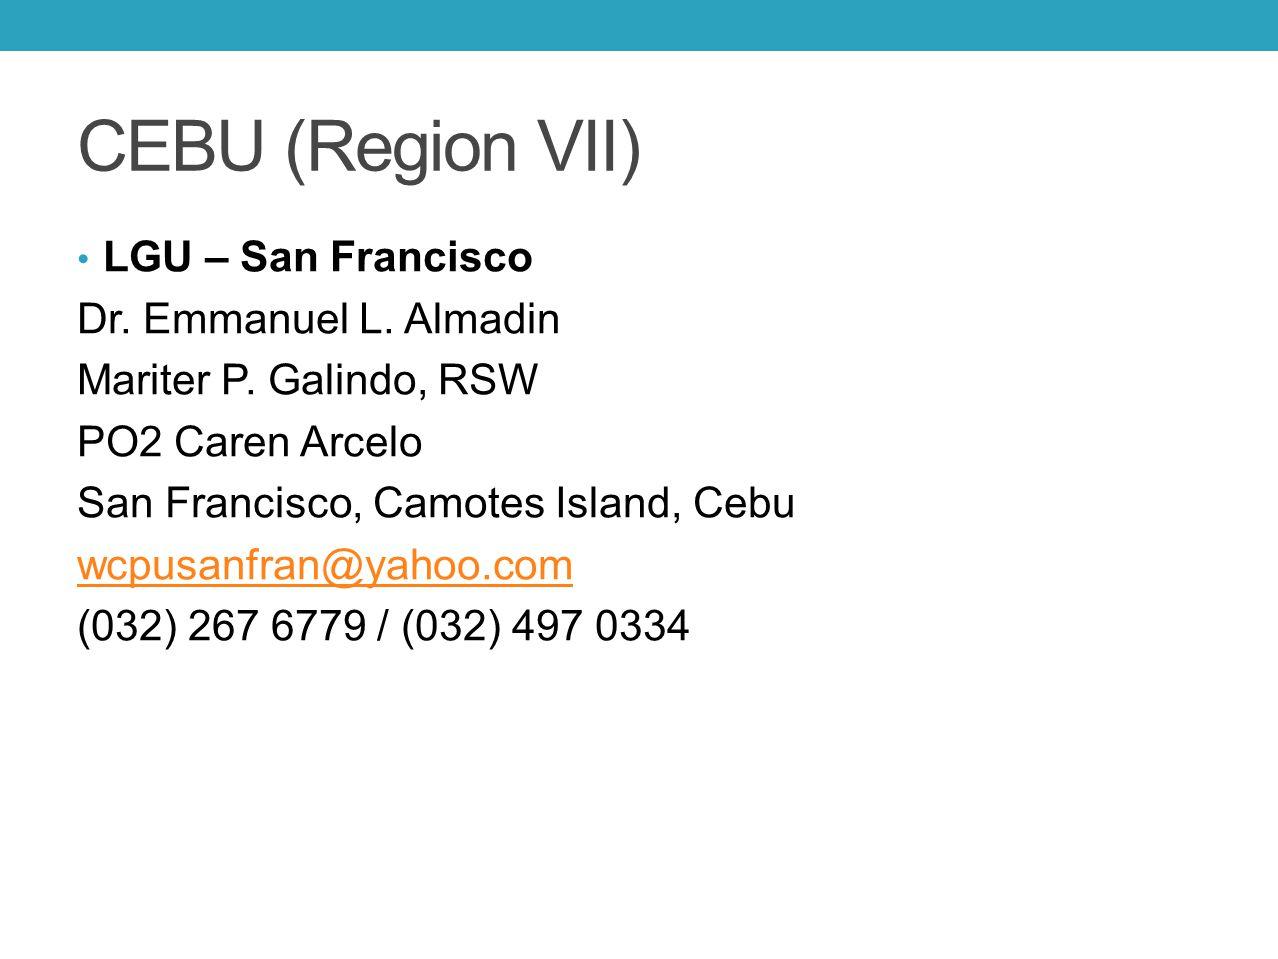 CEBU (Region VII) LGU – San Francisco Dr. Emmanuel L. Almadin